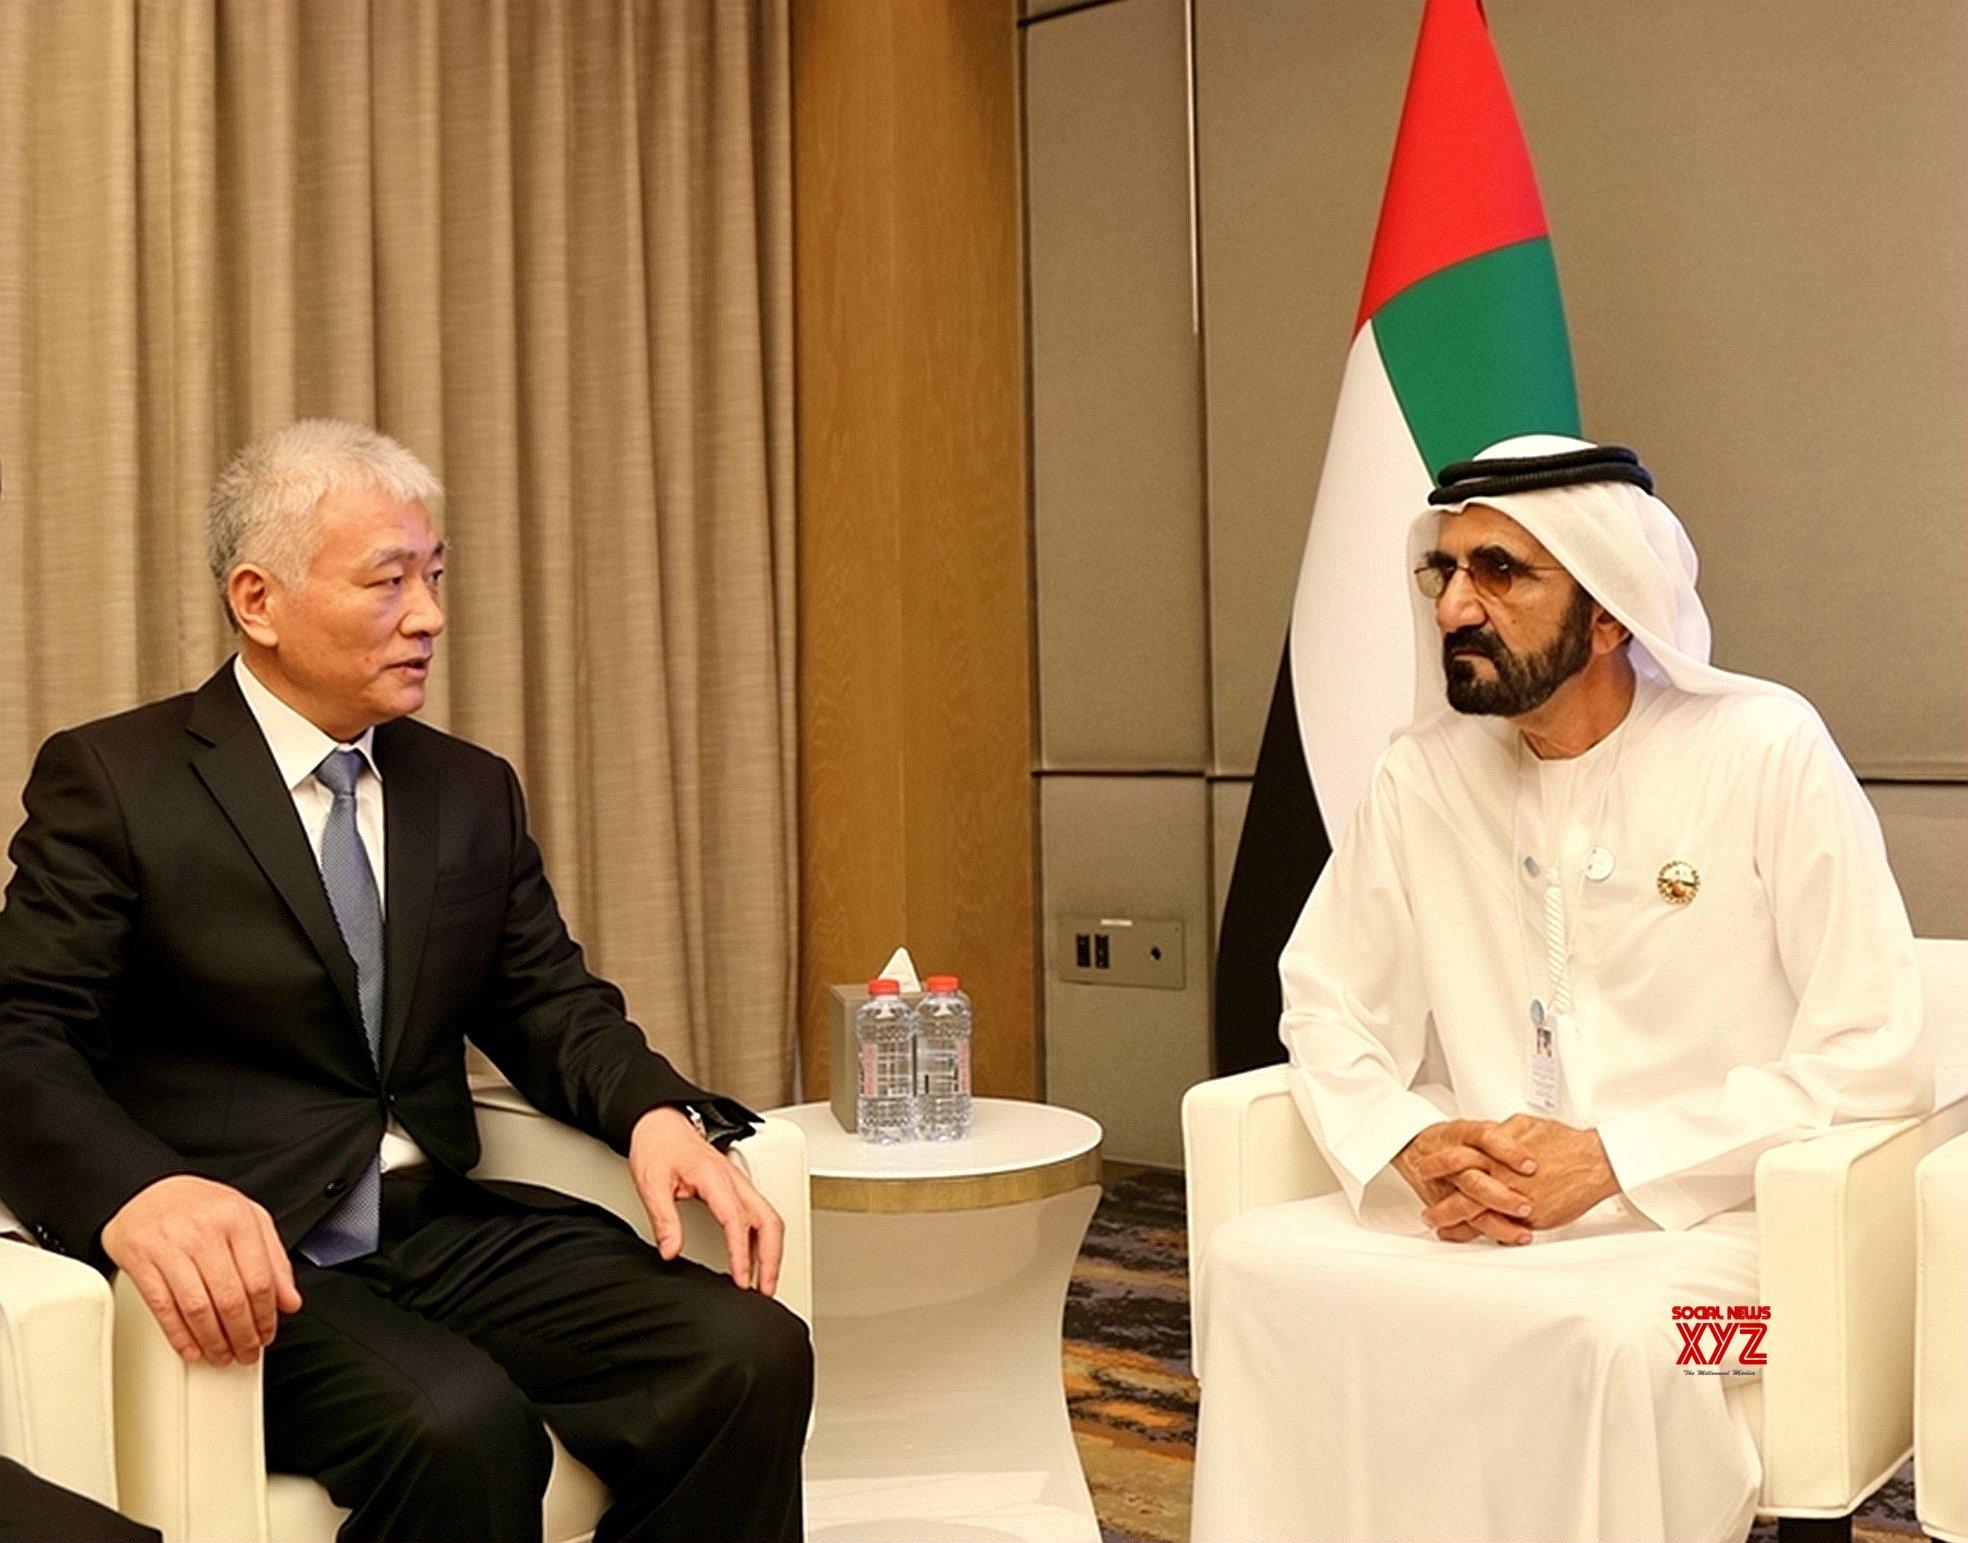 UAE - DUBAI - CHINA - WANG ZHIGANG - VISIT #Gallery